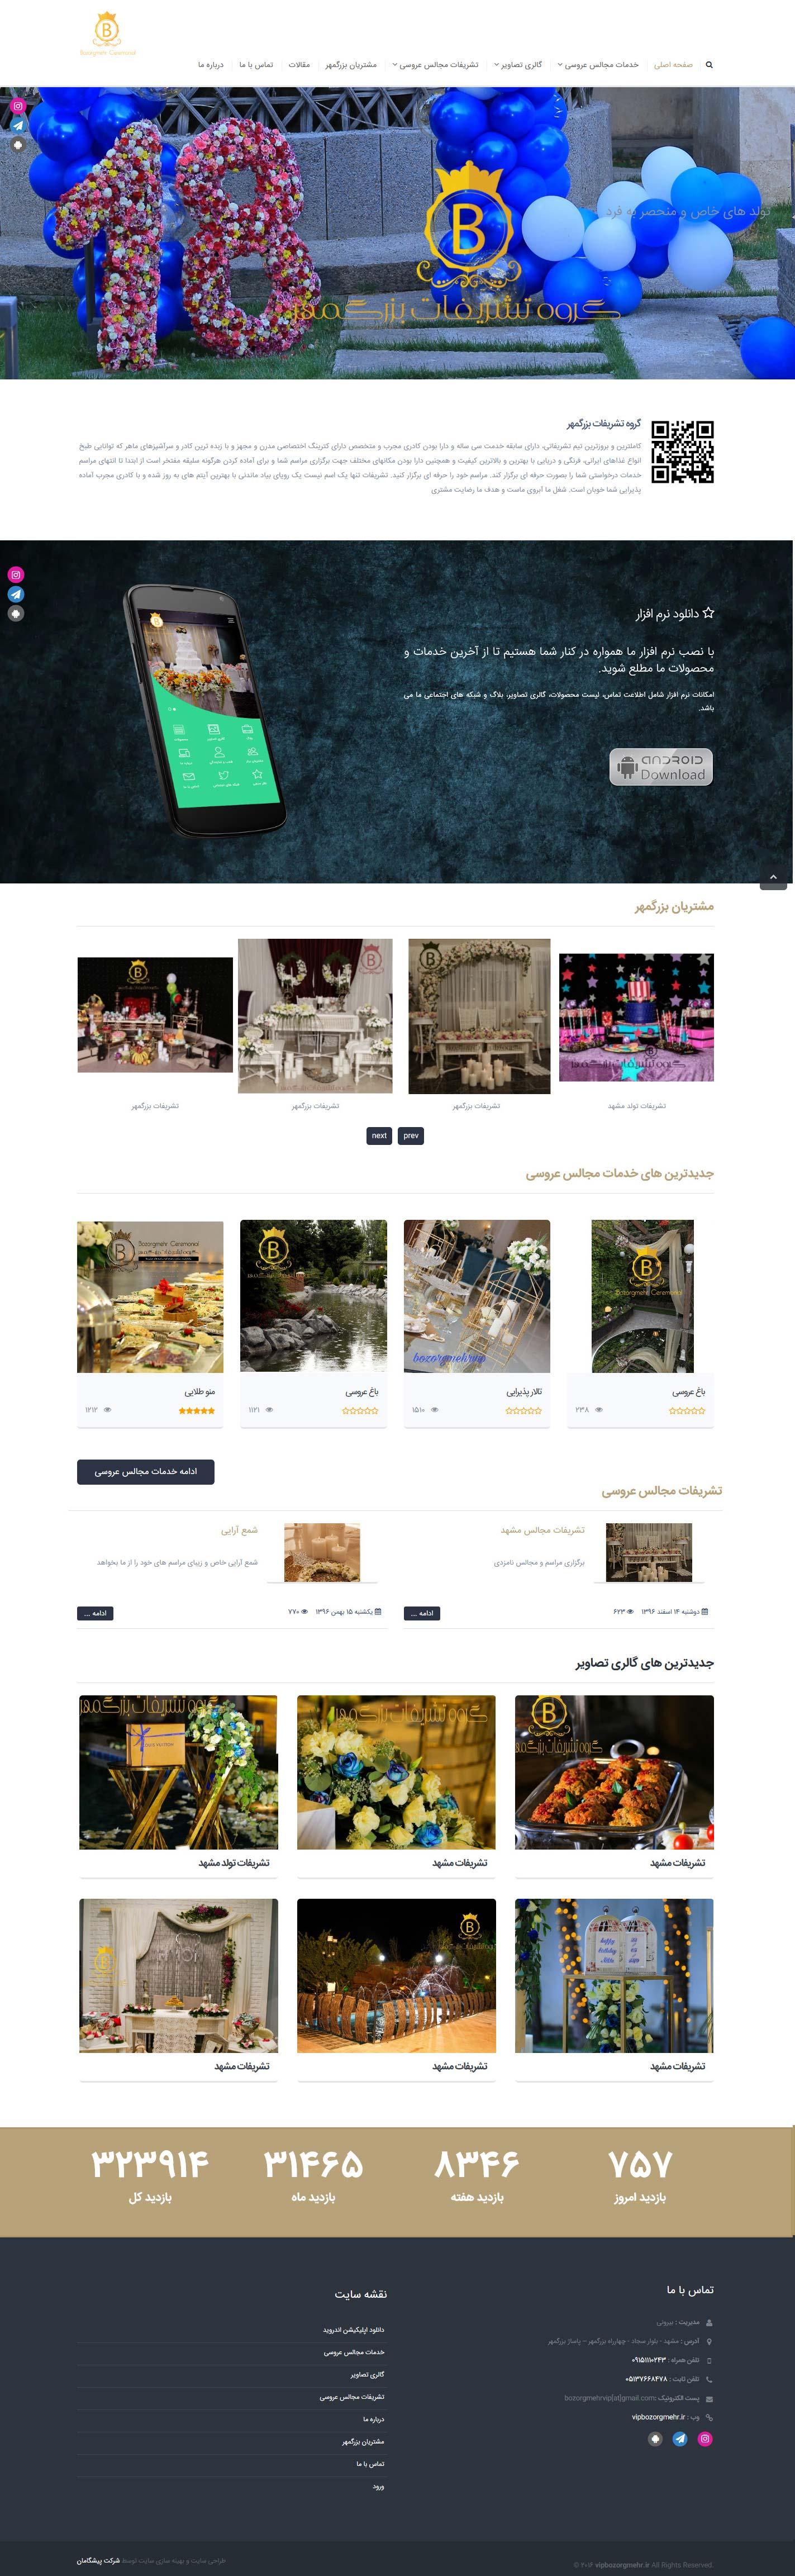 طراحی سایت تشریفات